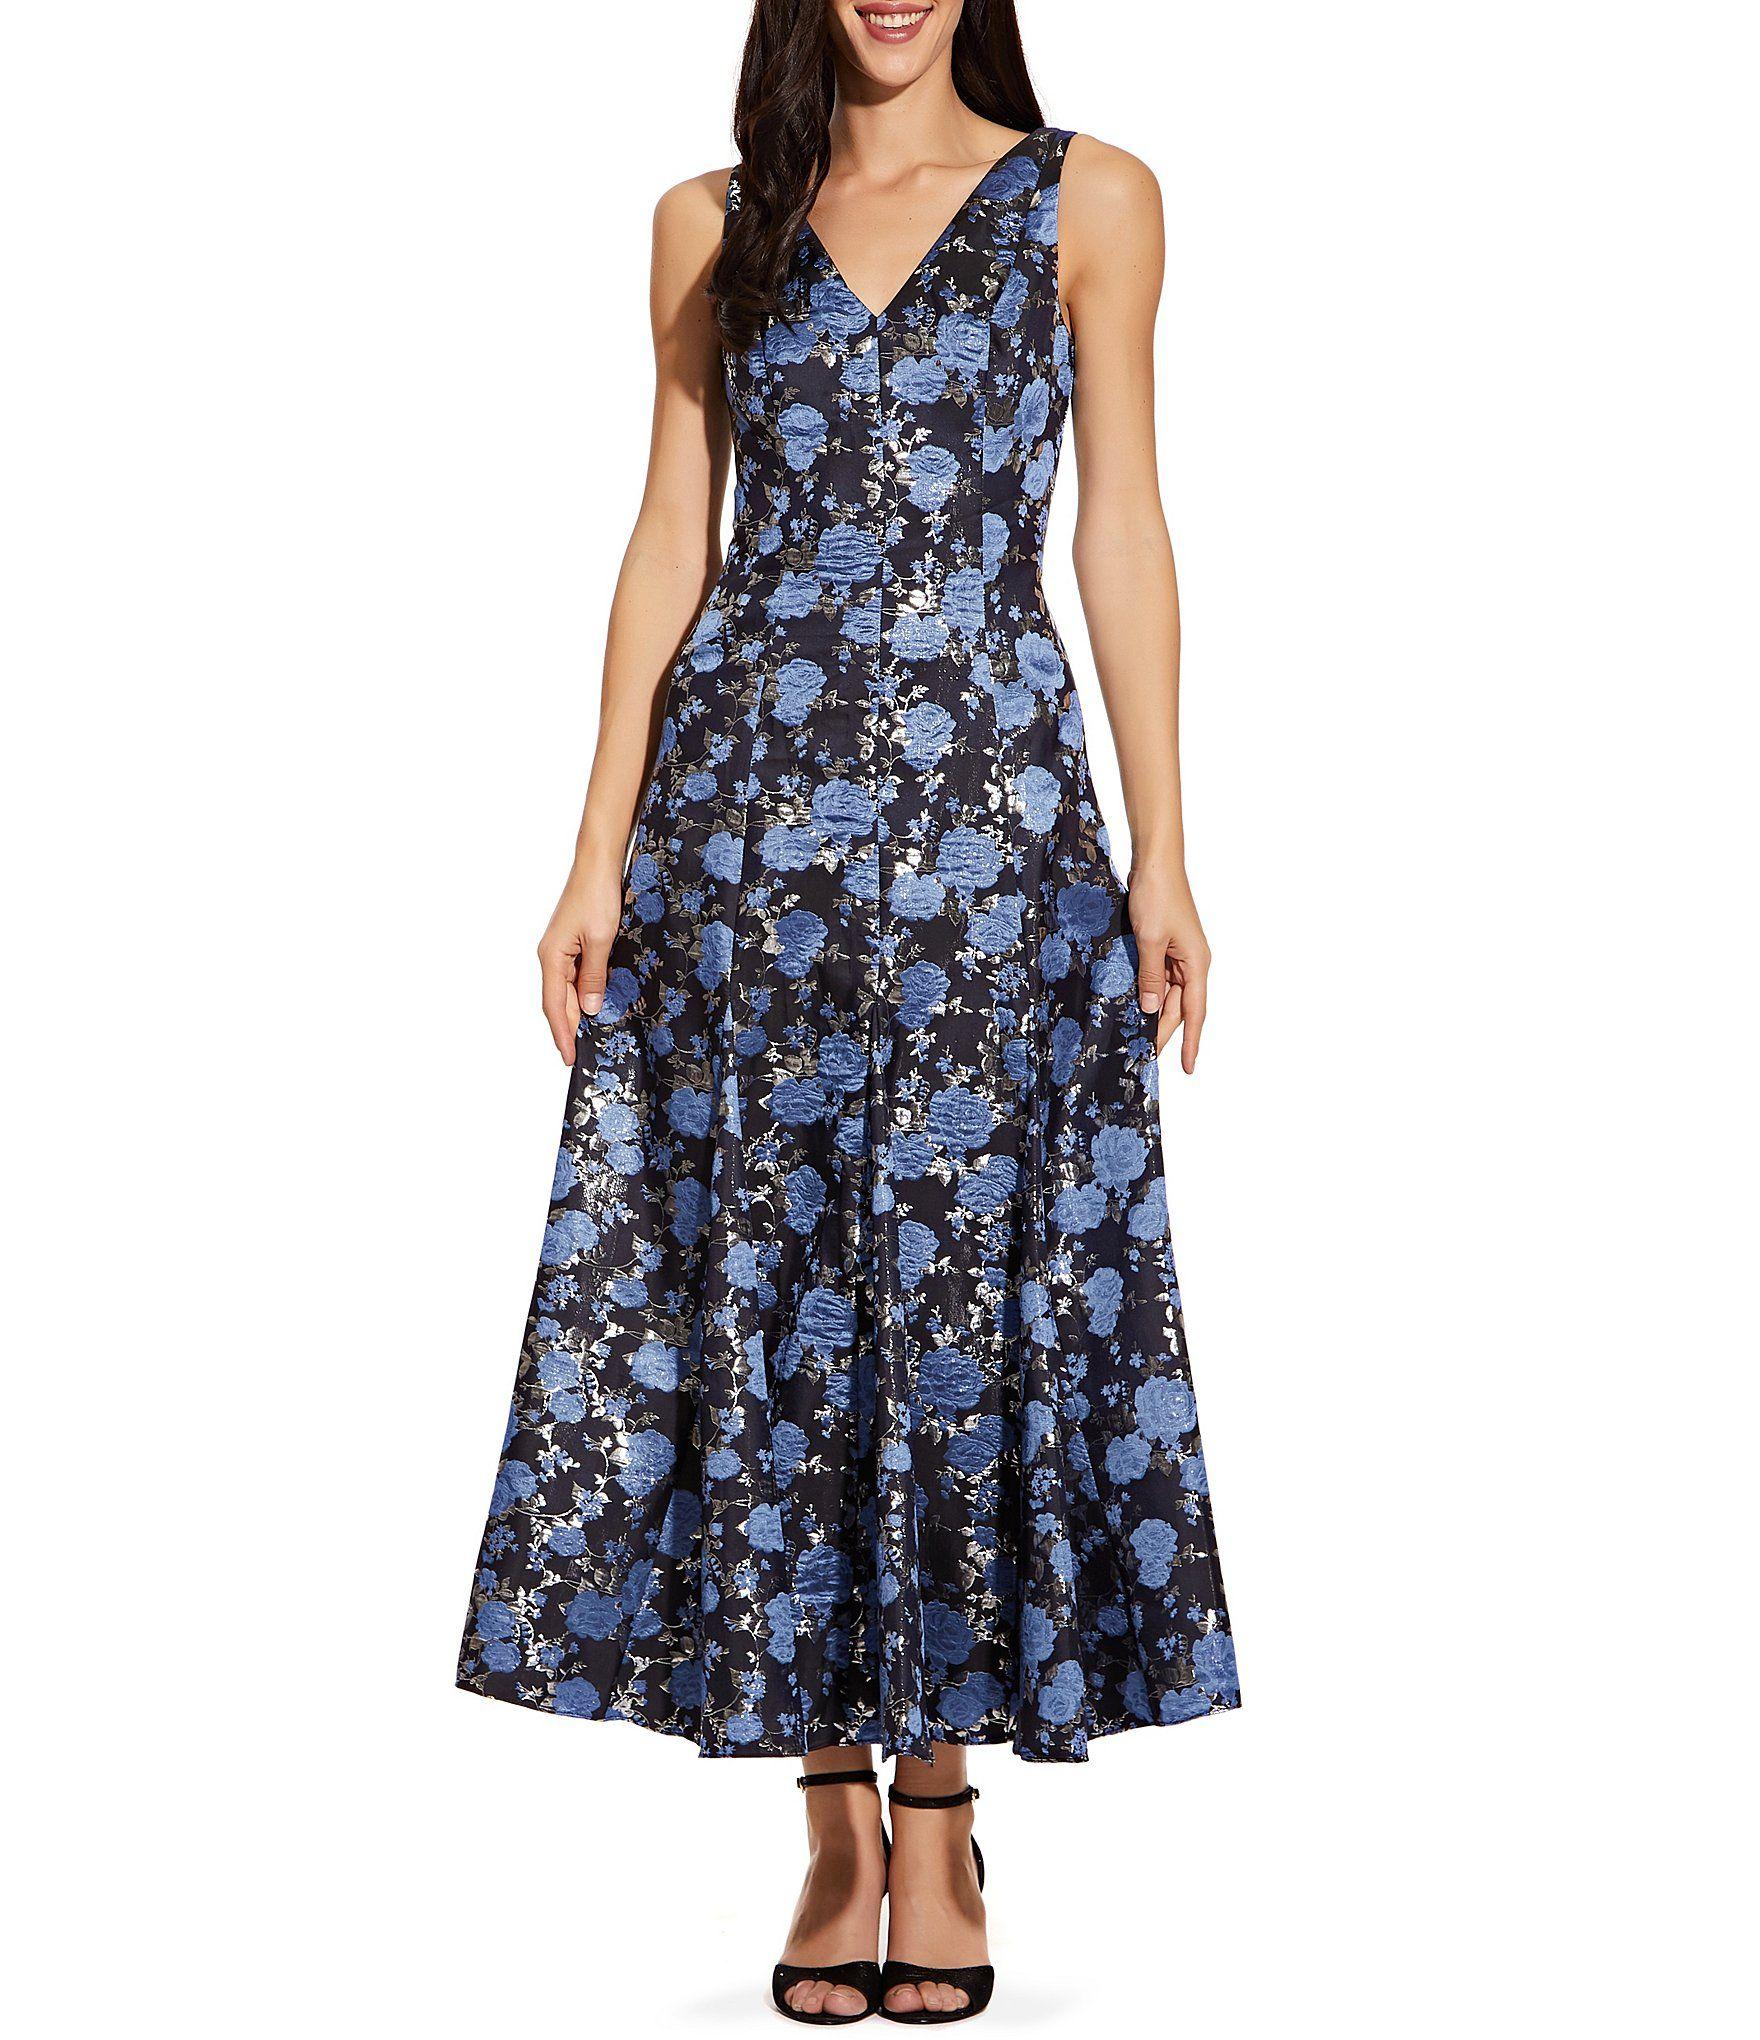 Adrianna Papell V-Neck Metallic Floral Print Tea Length A-Line Dress – Blue Multi 2